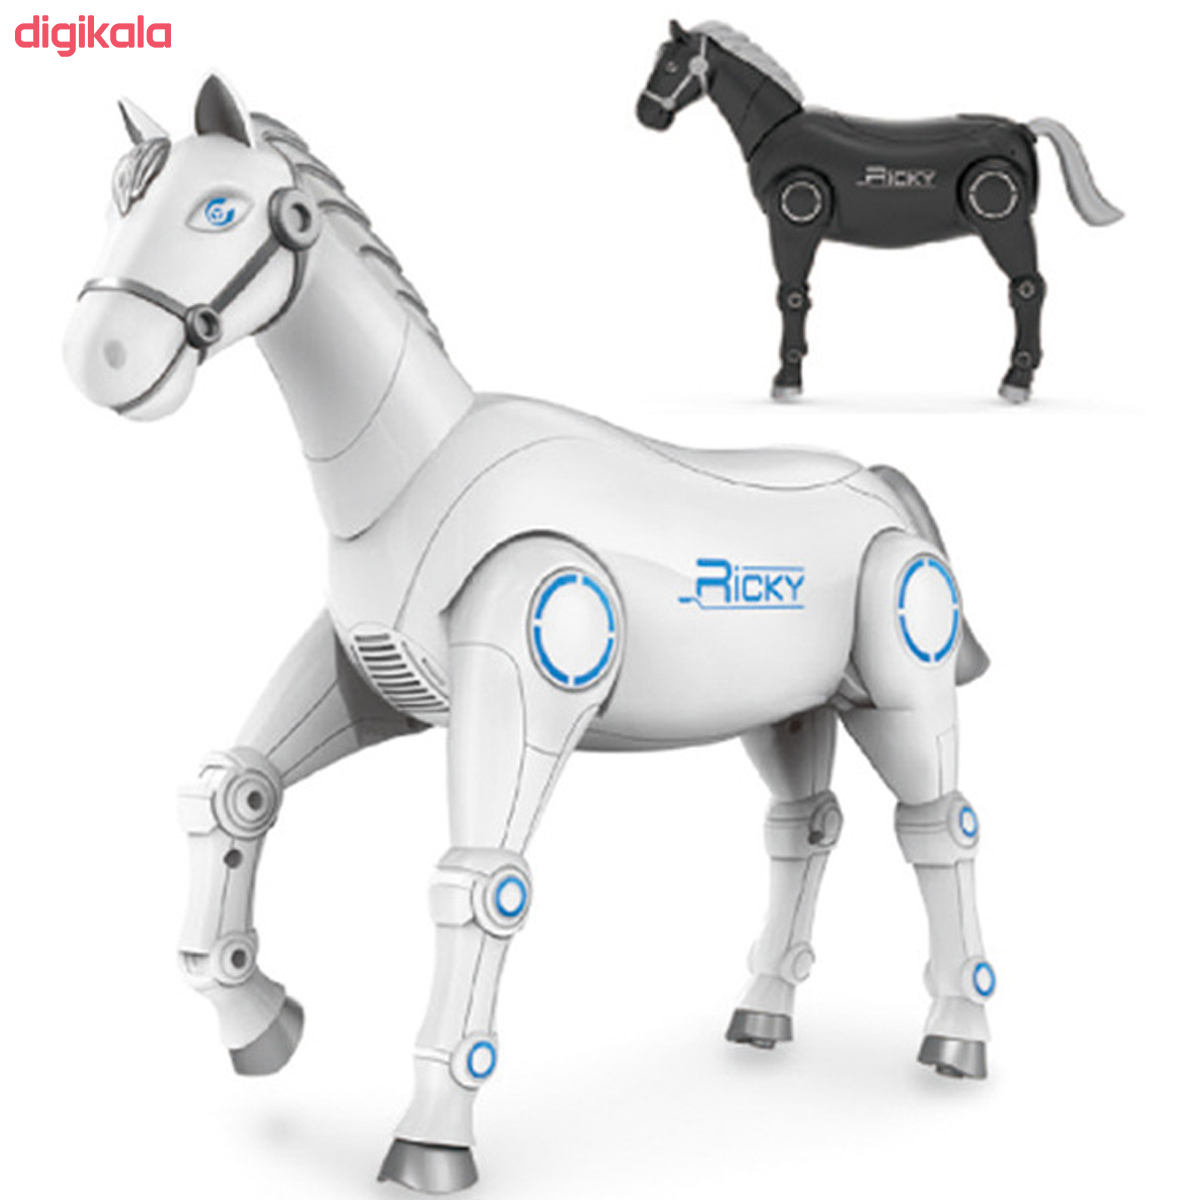 اسباب بازی طرح ربات مدل اسب هوشمند کد  A164966 main 1 1